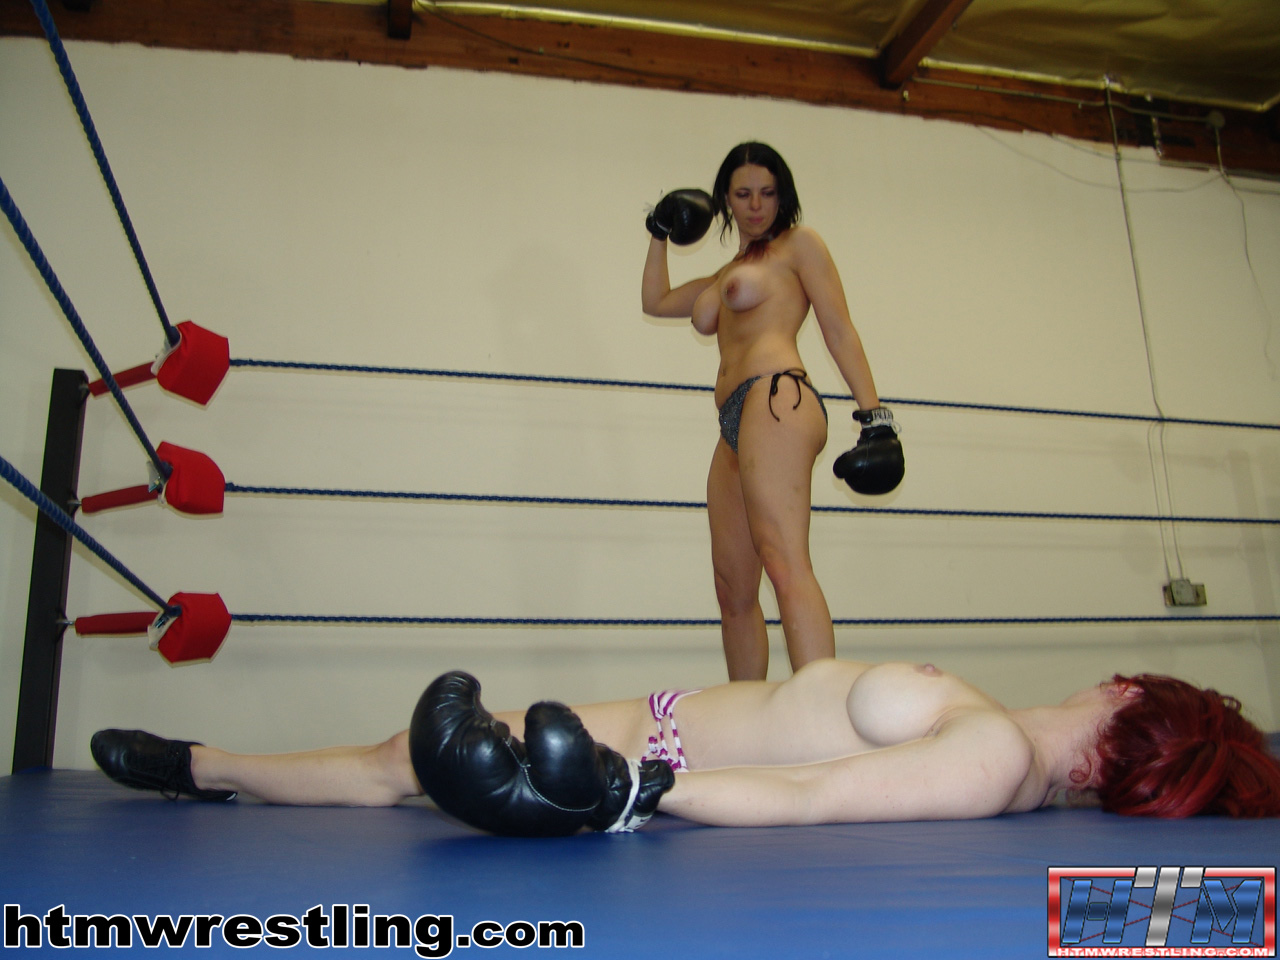 boks-golie-orgazm-foto